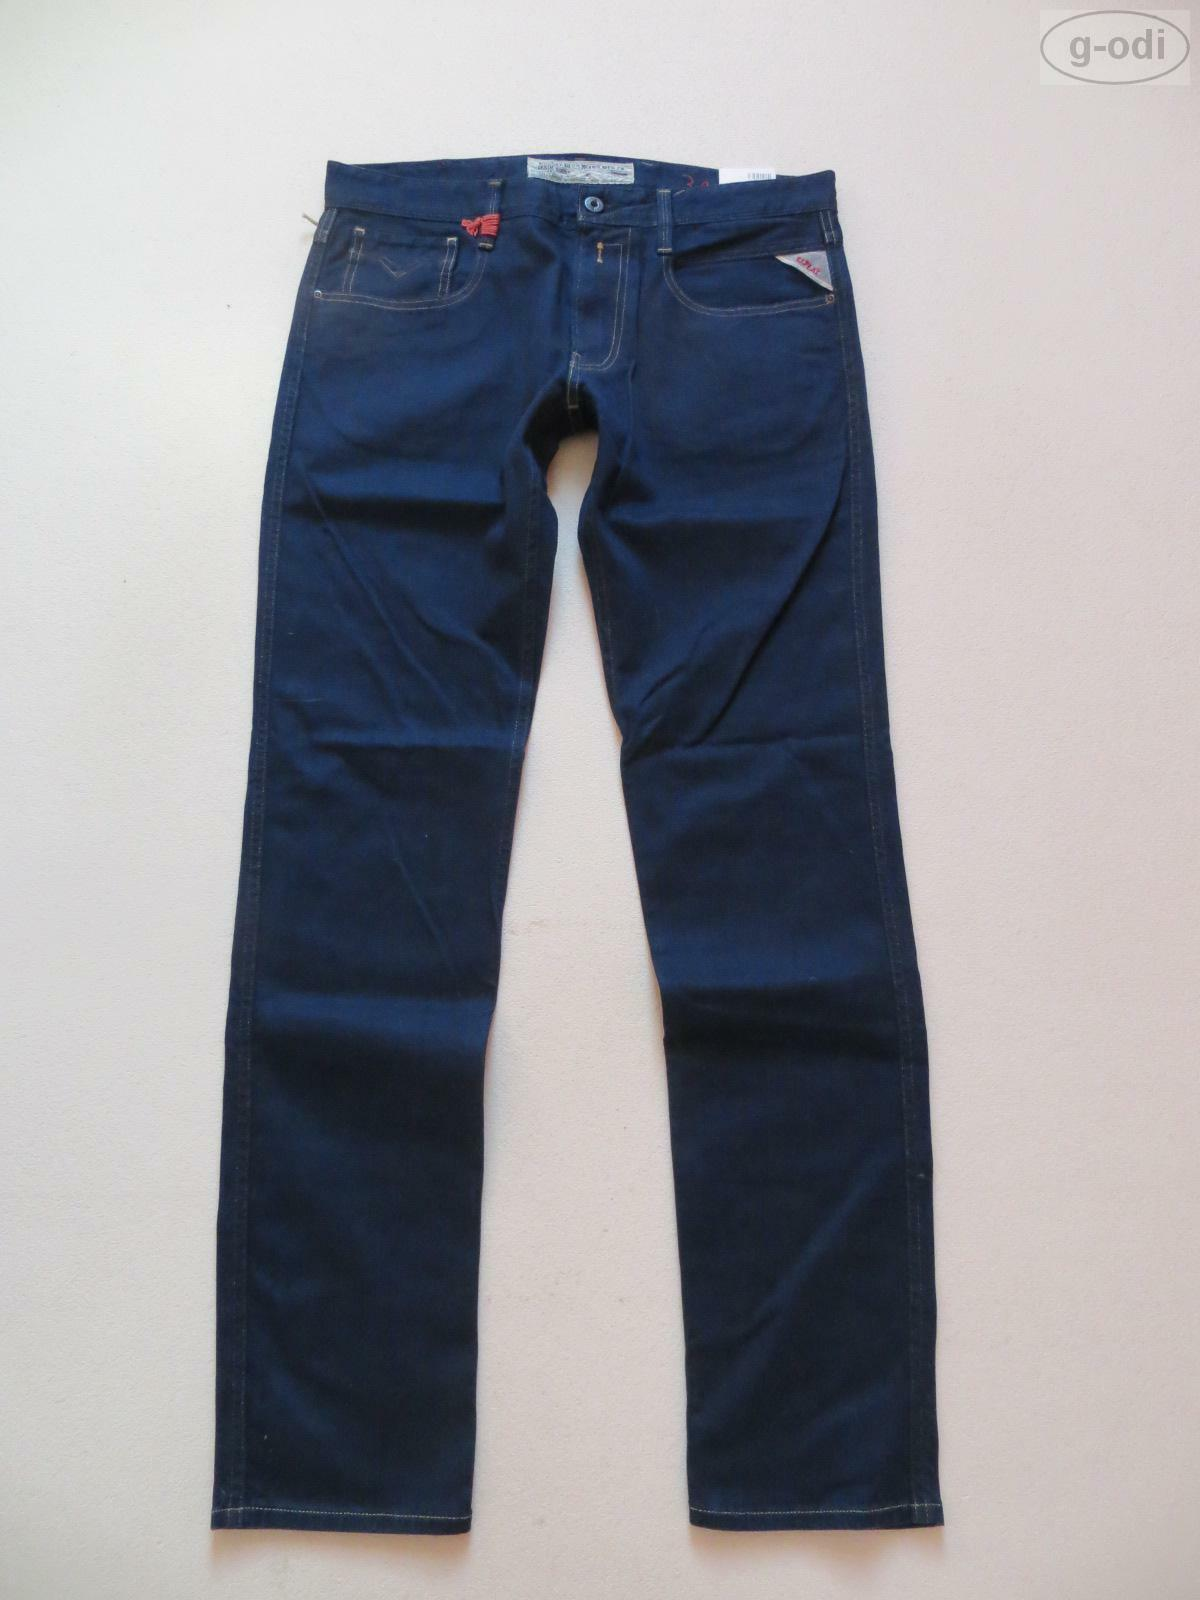 Replay ANBASS Skinny Fit Jeans Hose, W 34  L 34, NEU   Indigo Stretch Denim   50